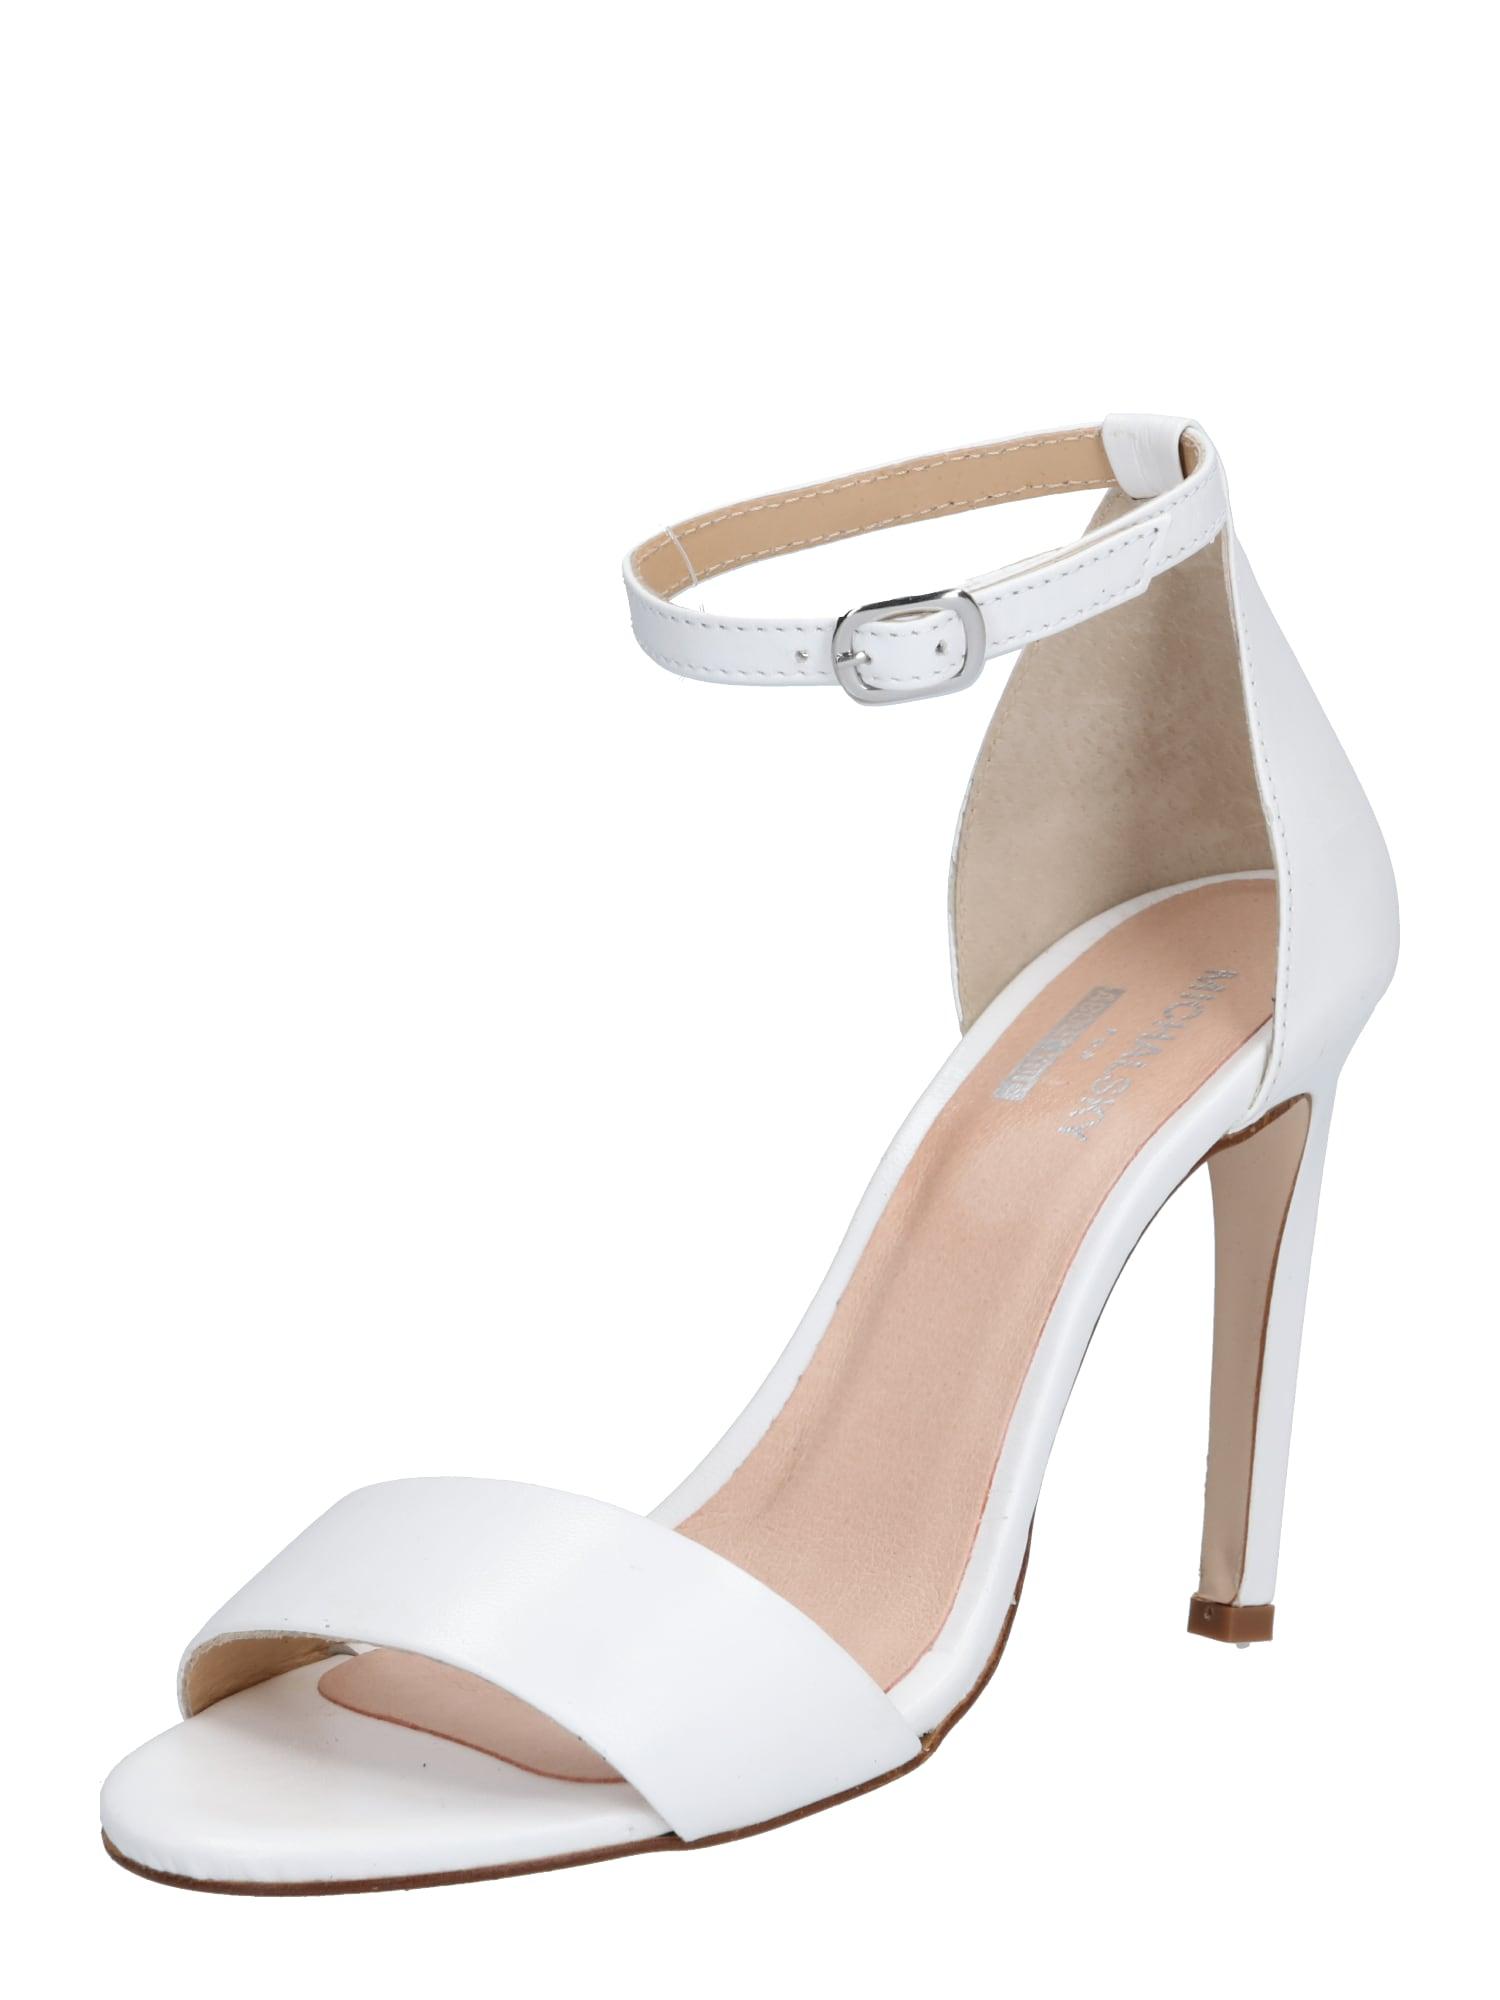 MICHALSKY FOR ABOUT YOU Basutės su dirželiais 'Holly sandal' balta